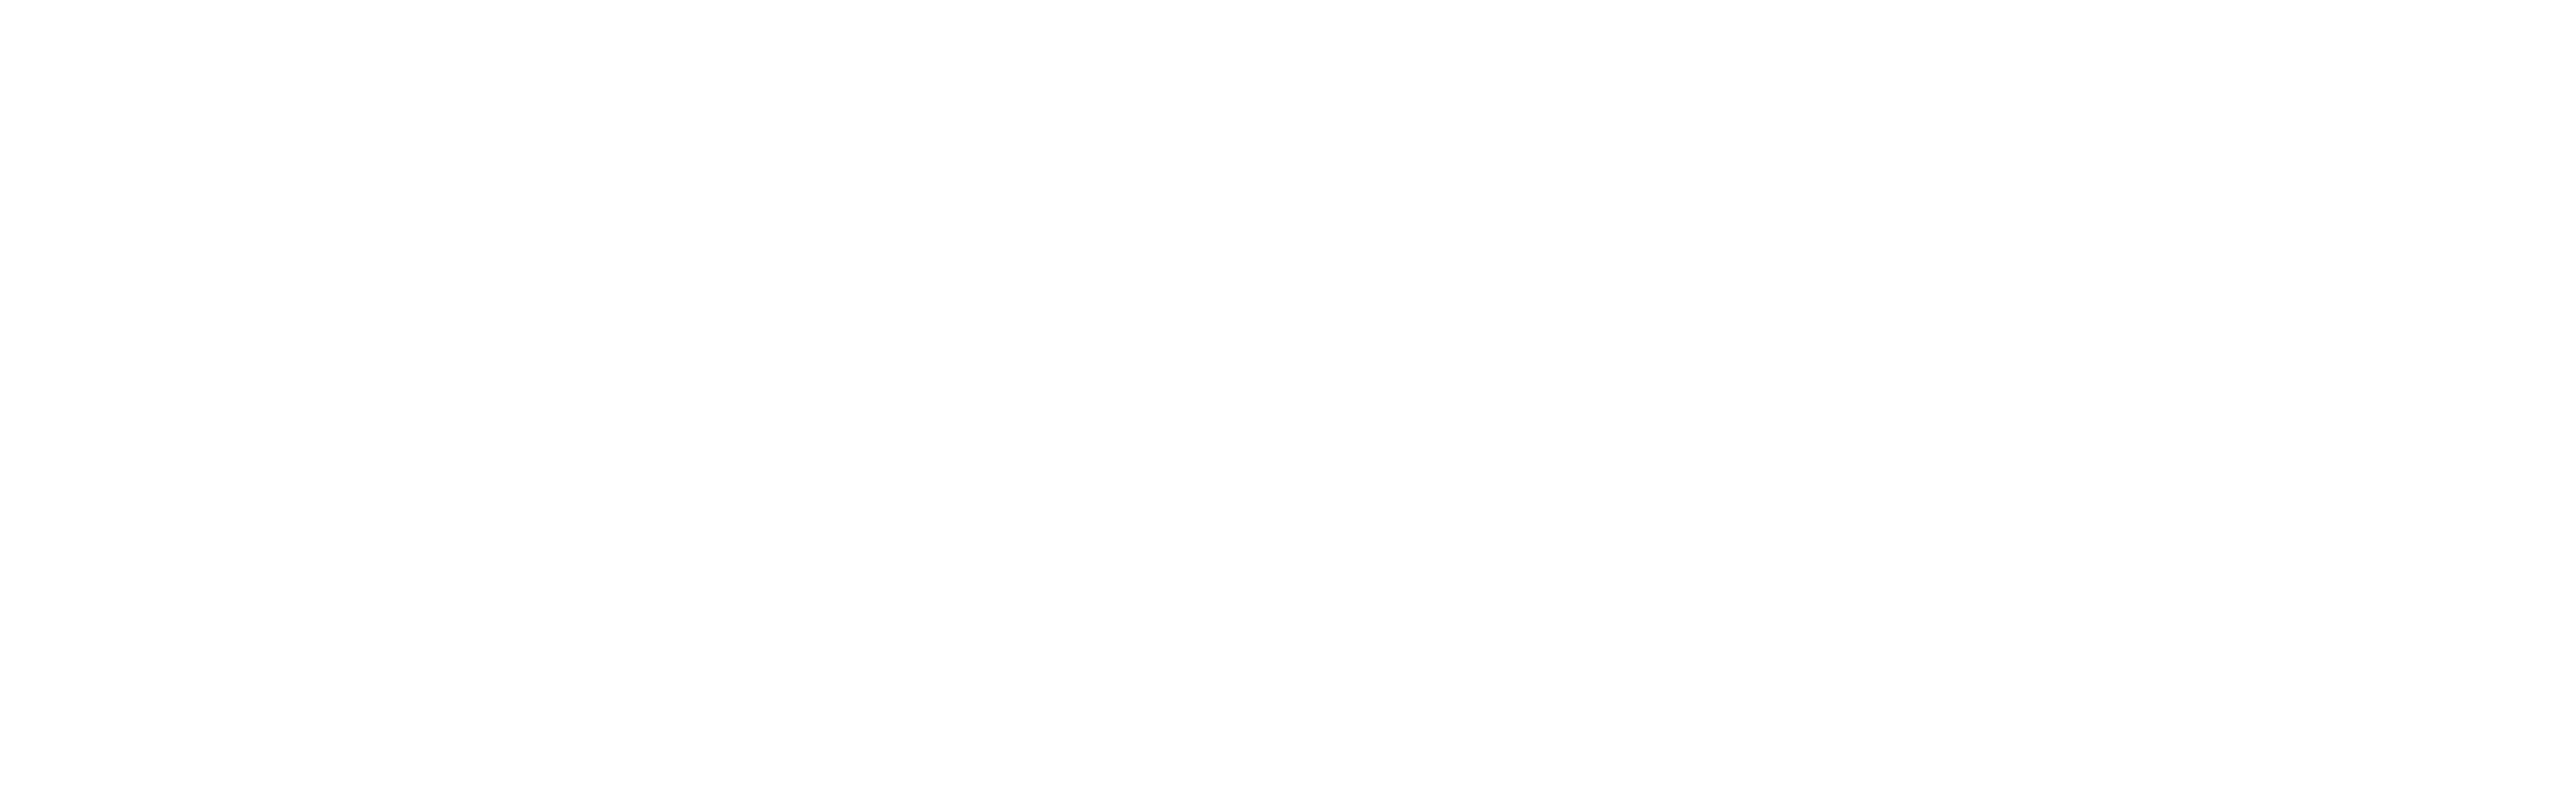 Frost-logo_white-01